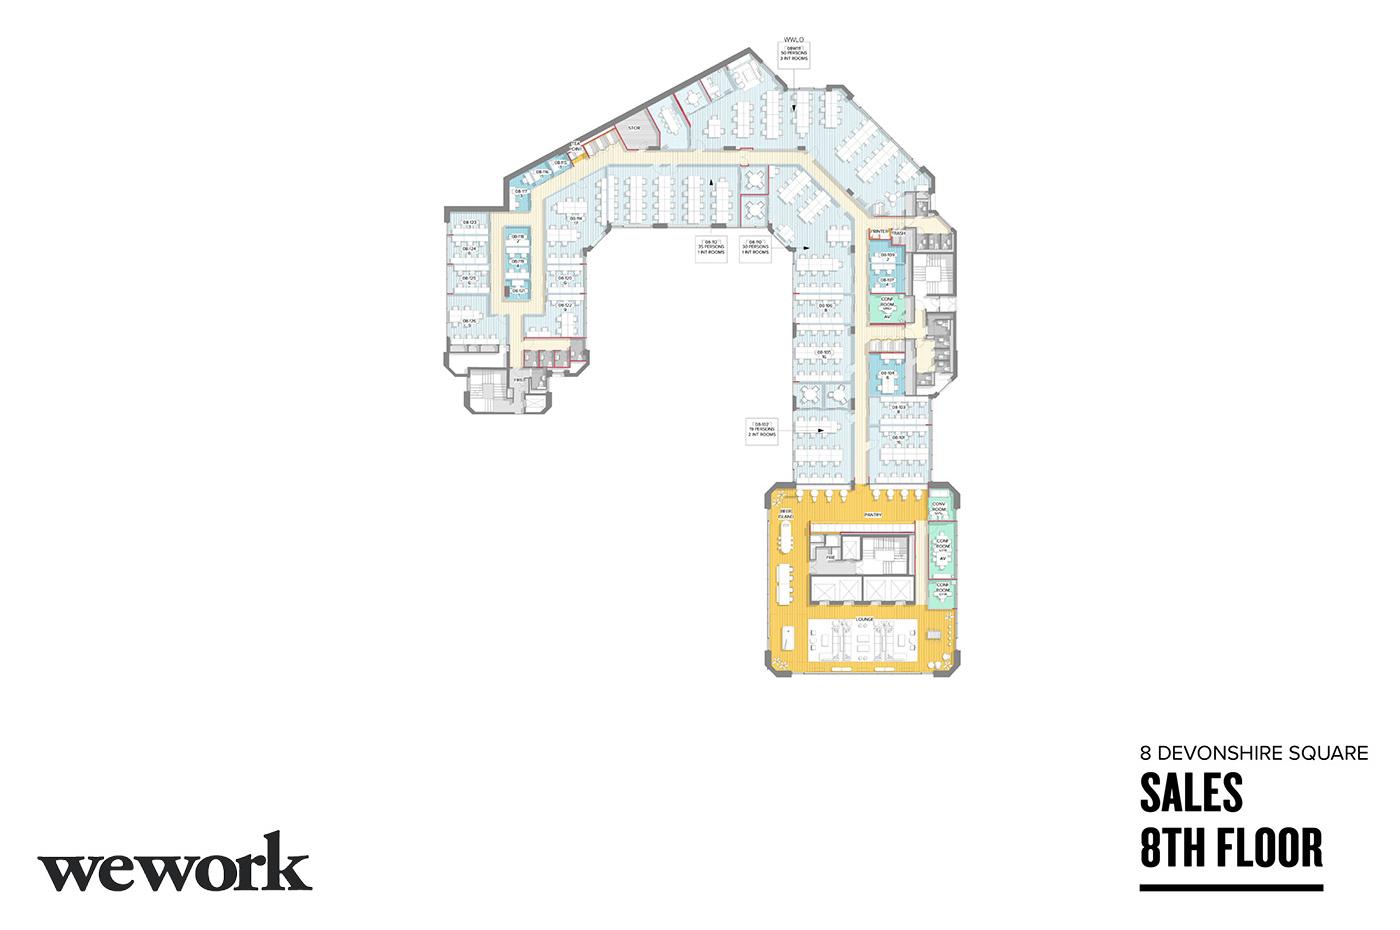 floorplans-9 copy.jpg